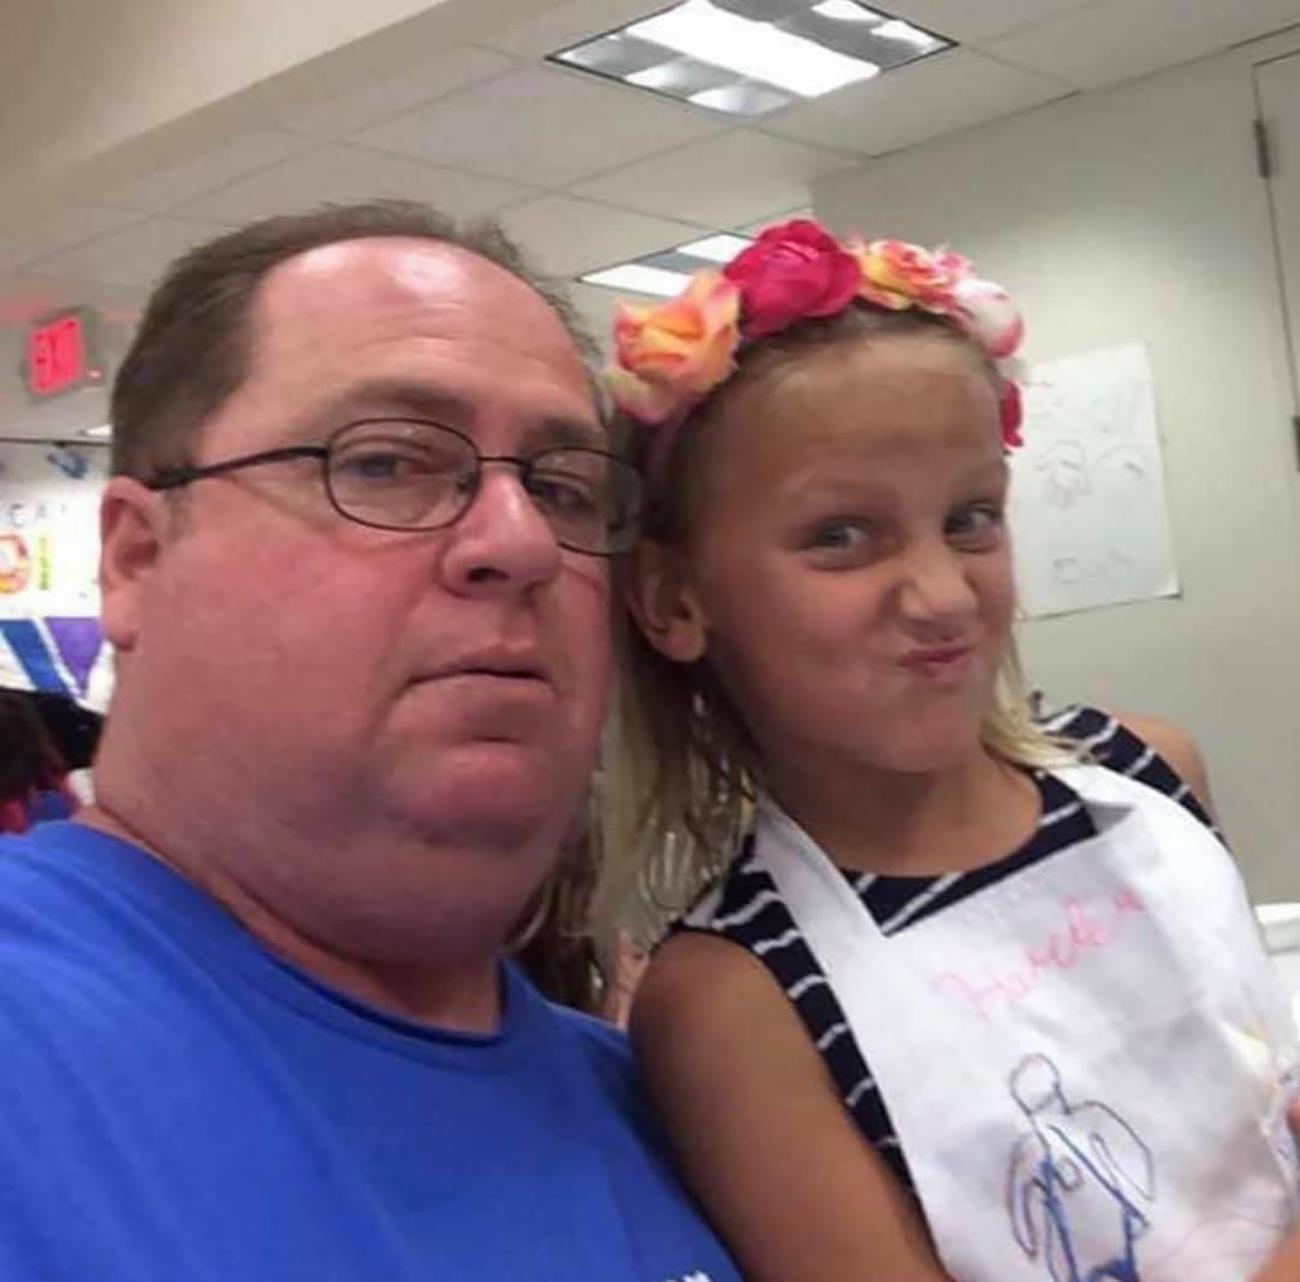 Guy Alexander Hansman and daughter